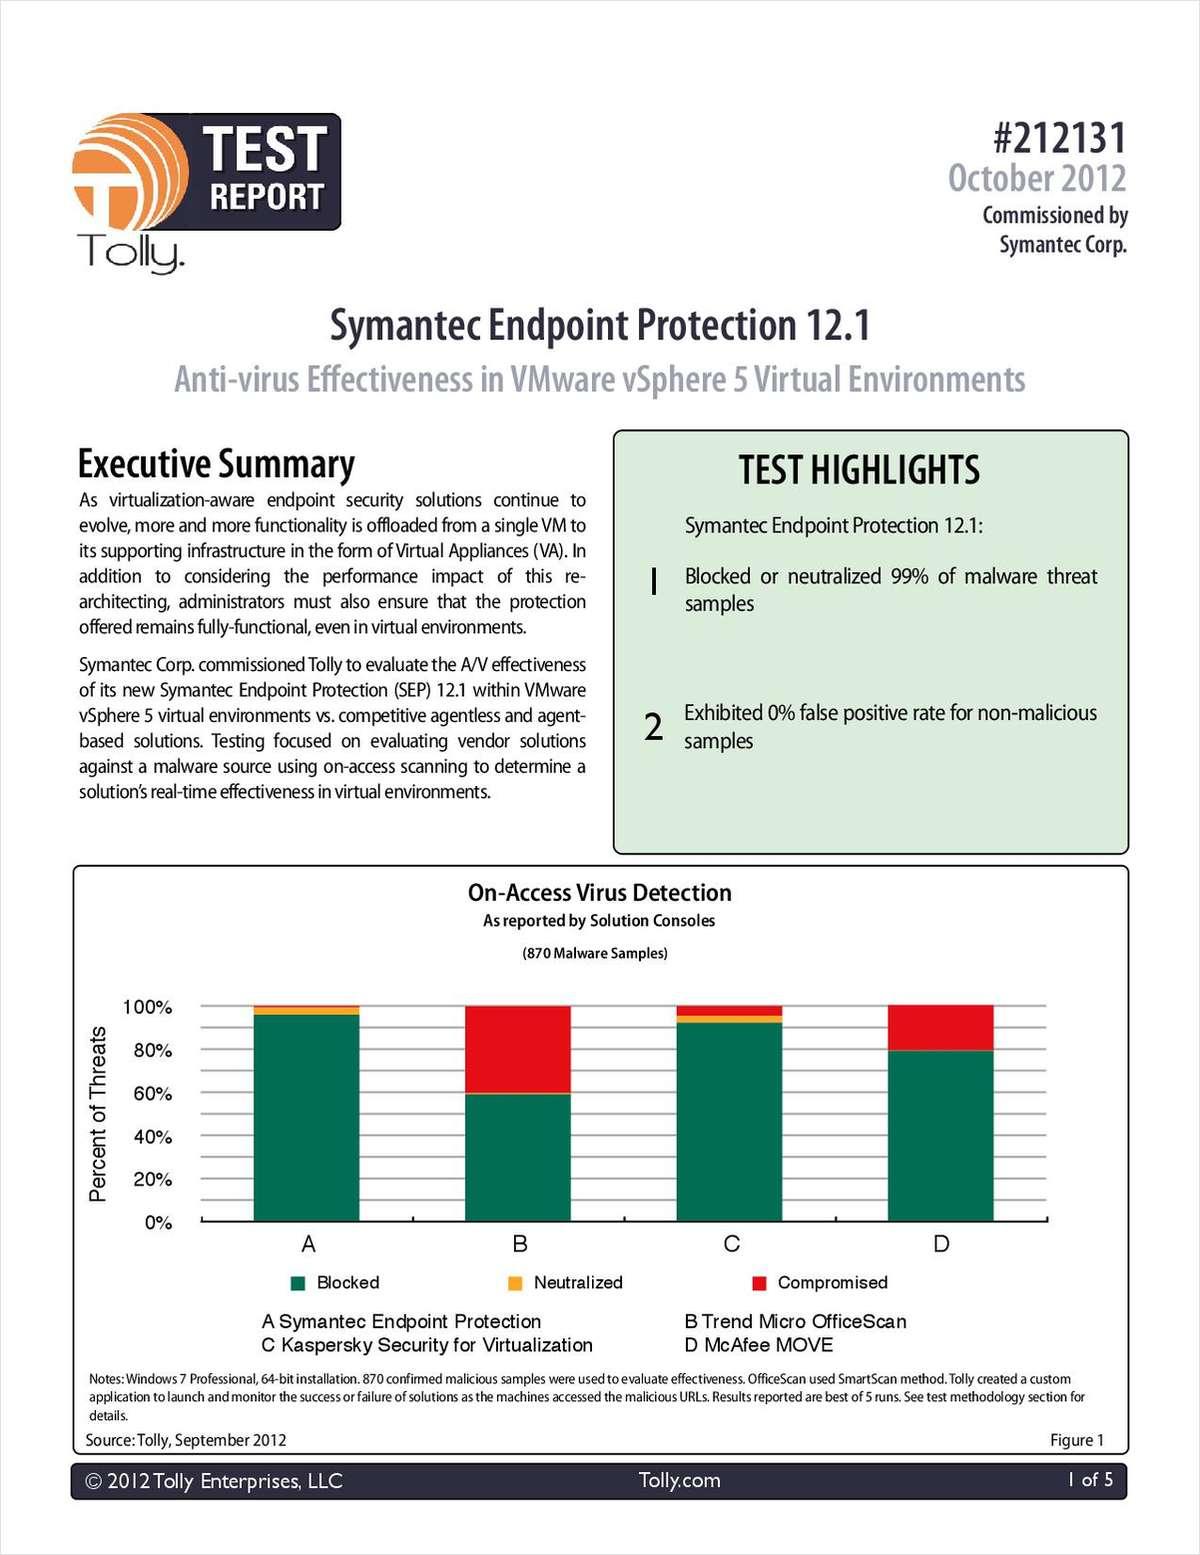 Tolly Test Report: Anti-virus Effectiveness in VMware vSphere 5 Virtual Environments